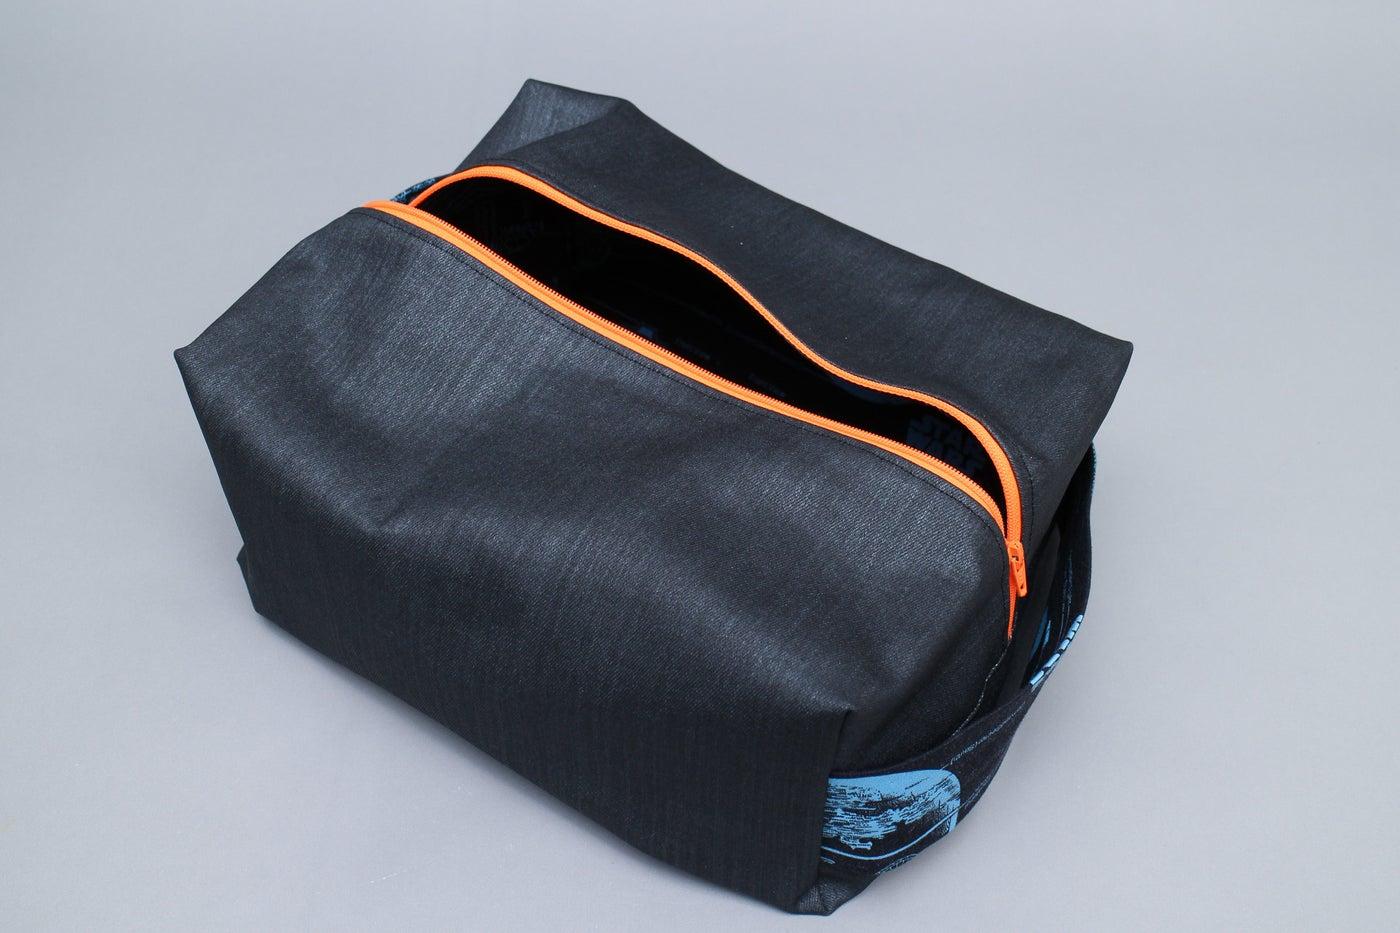 sewing covers-44.jpg